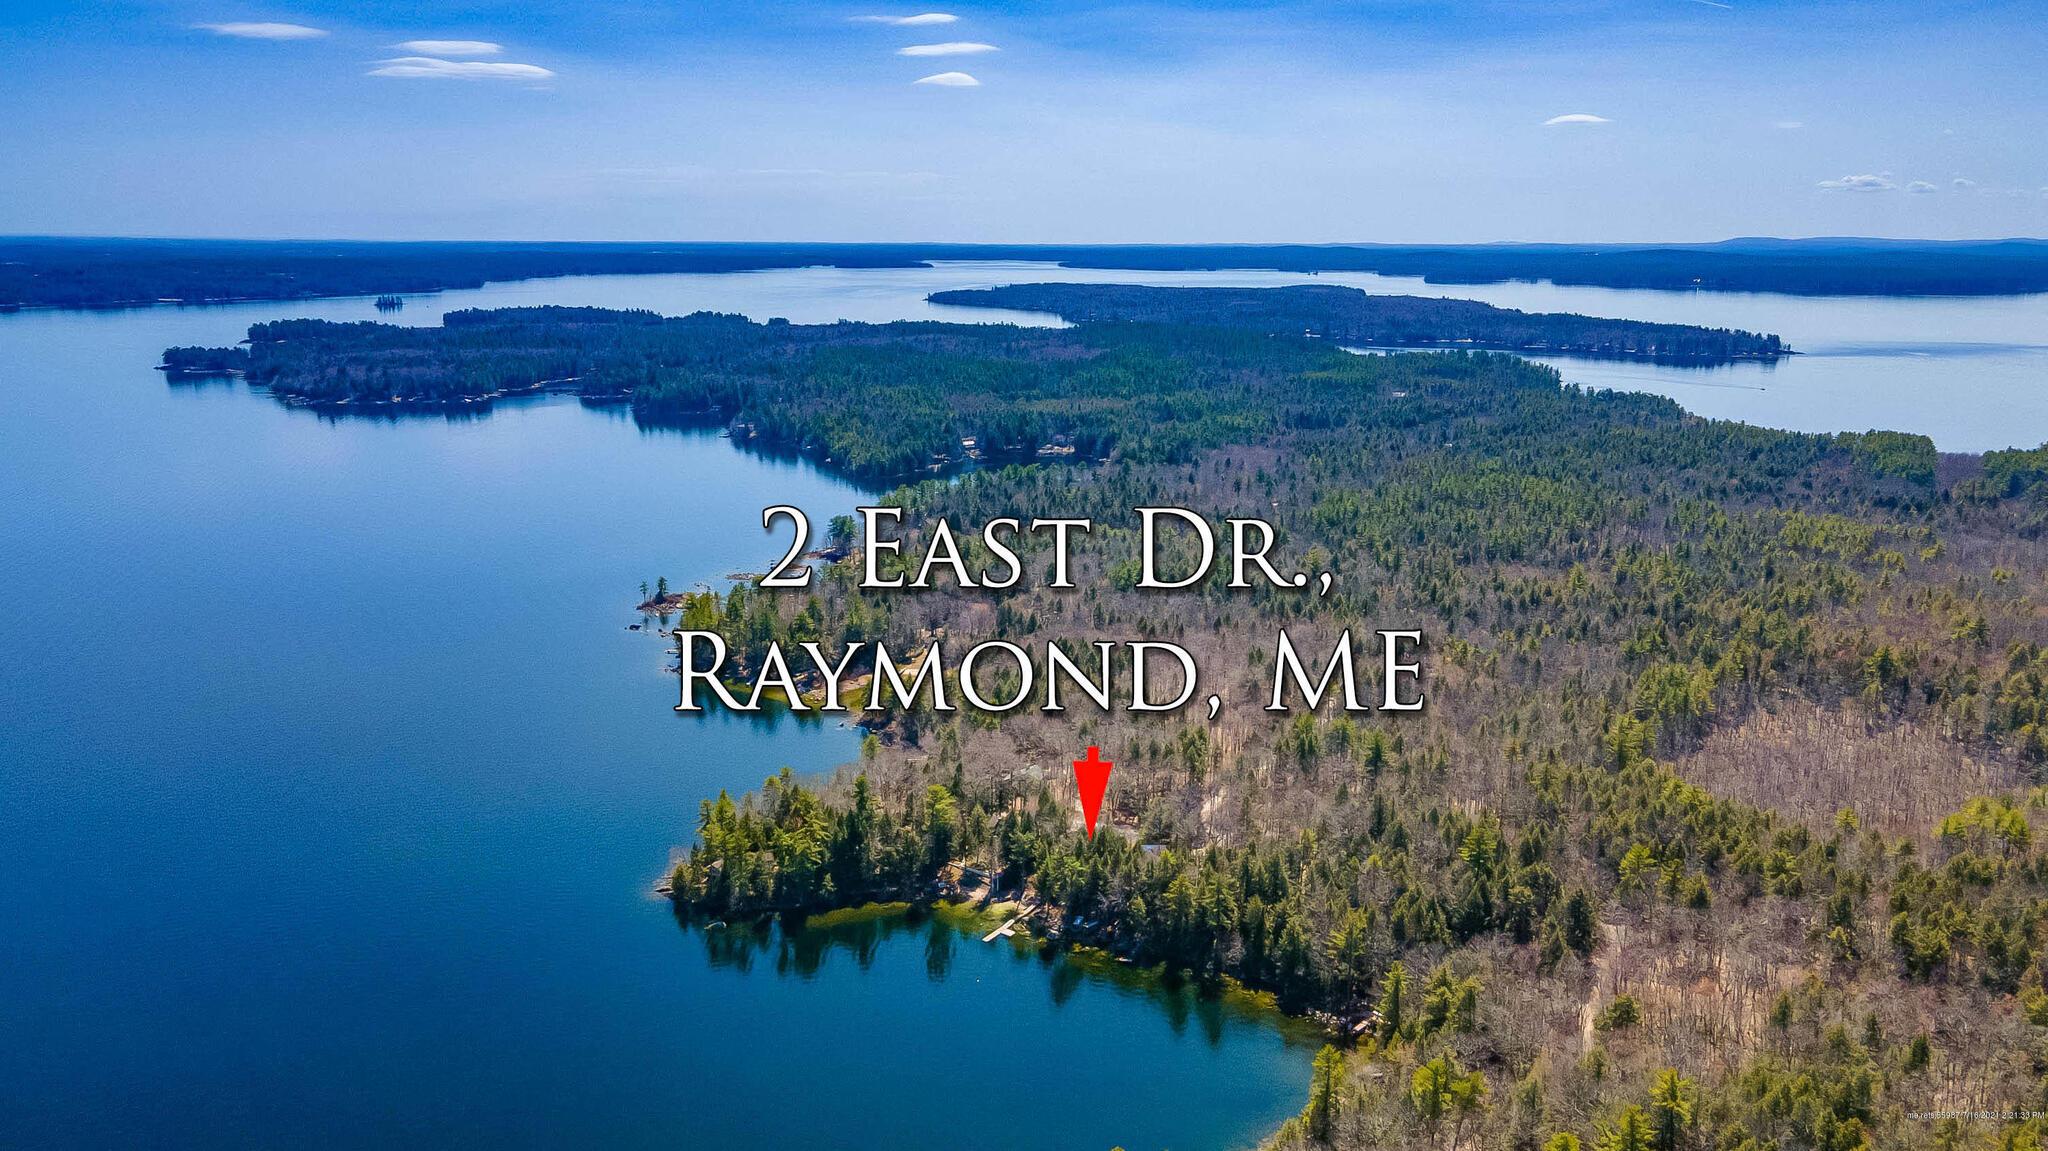 Photo of 2 East Drive Raymond ME 04071